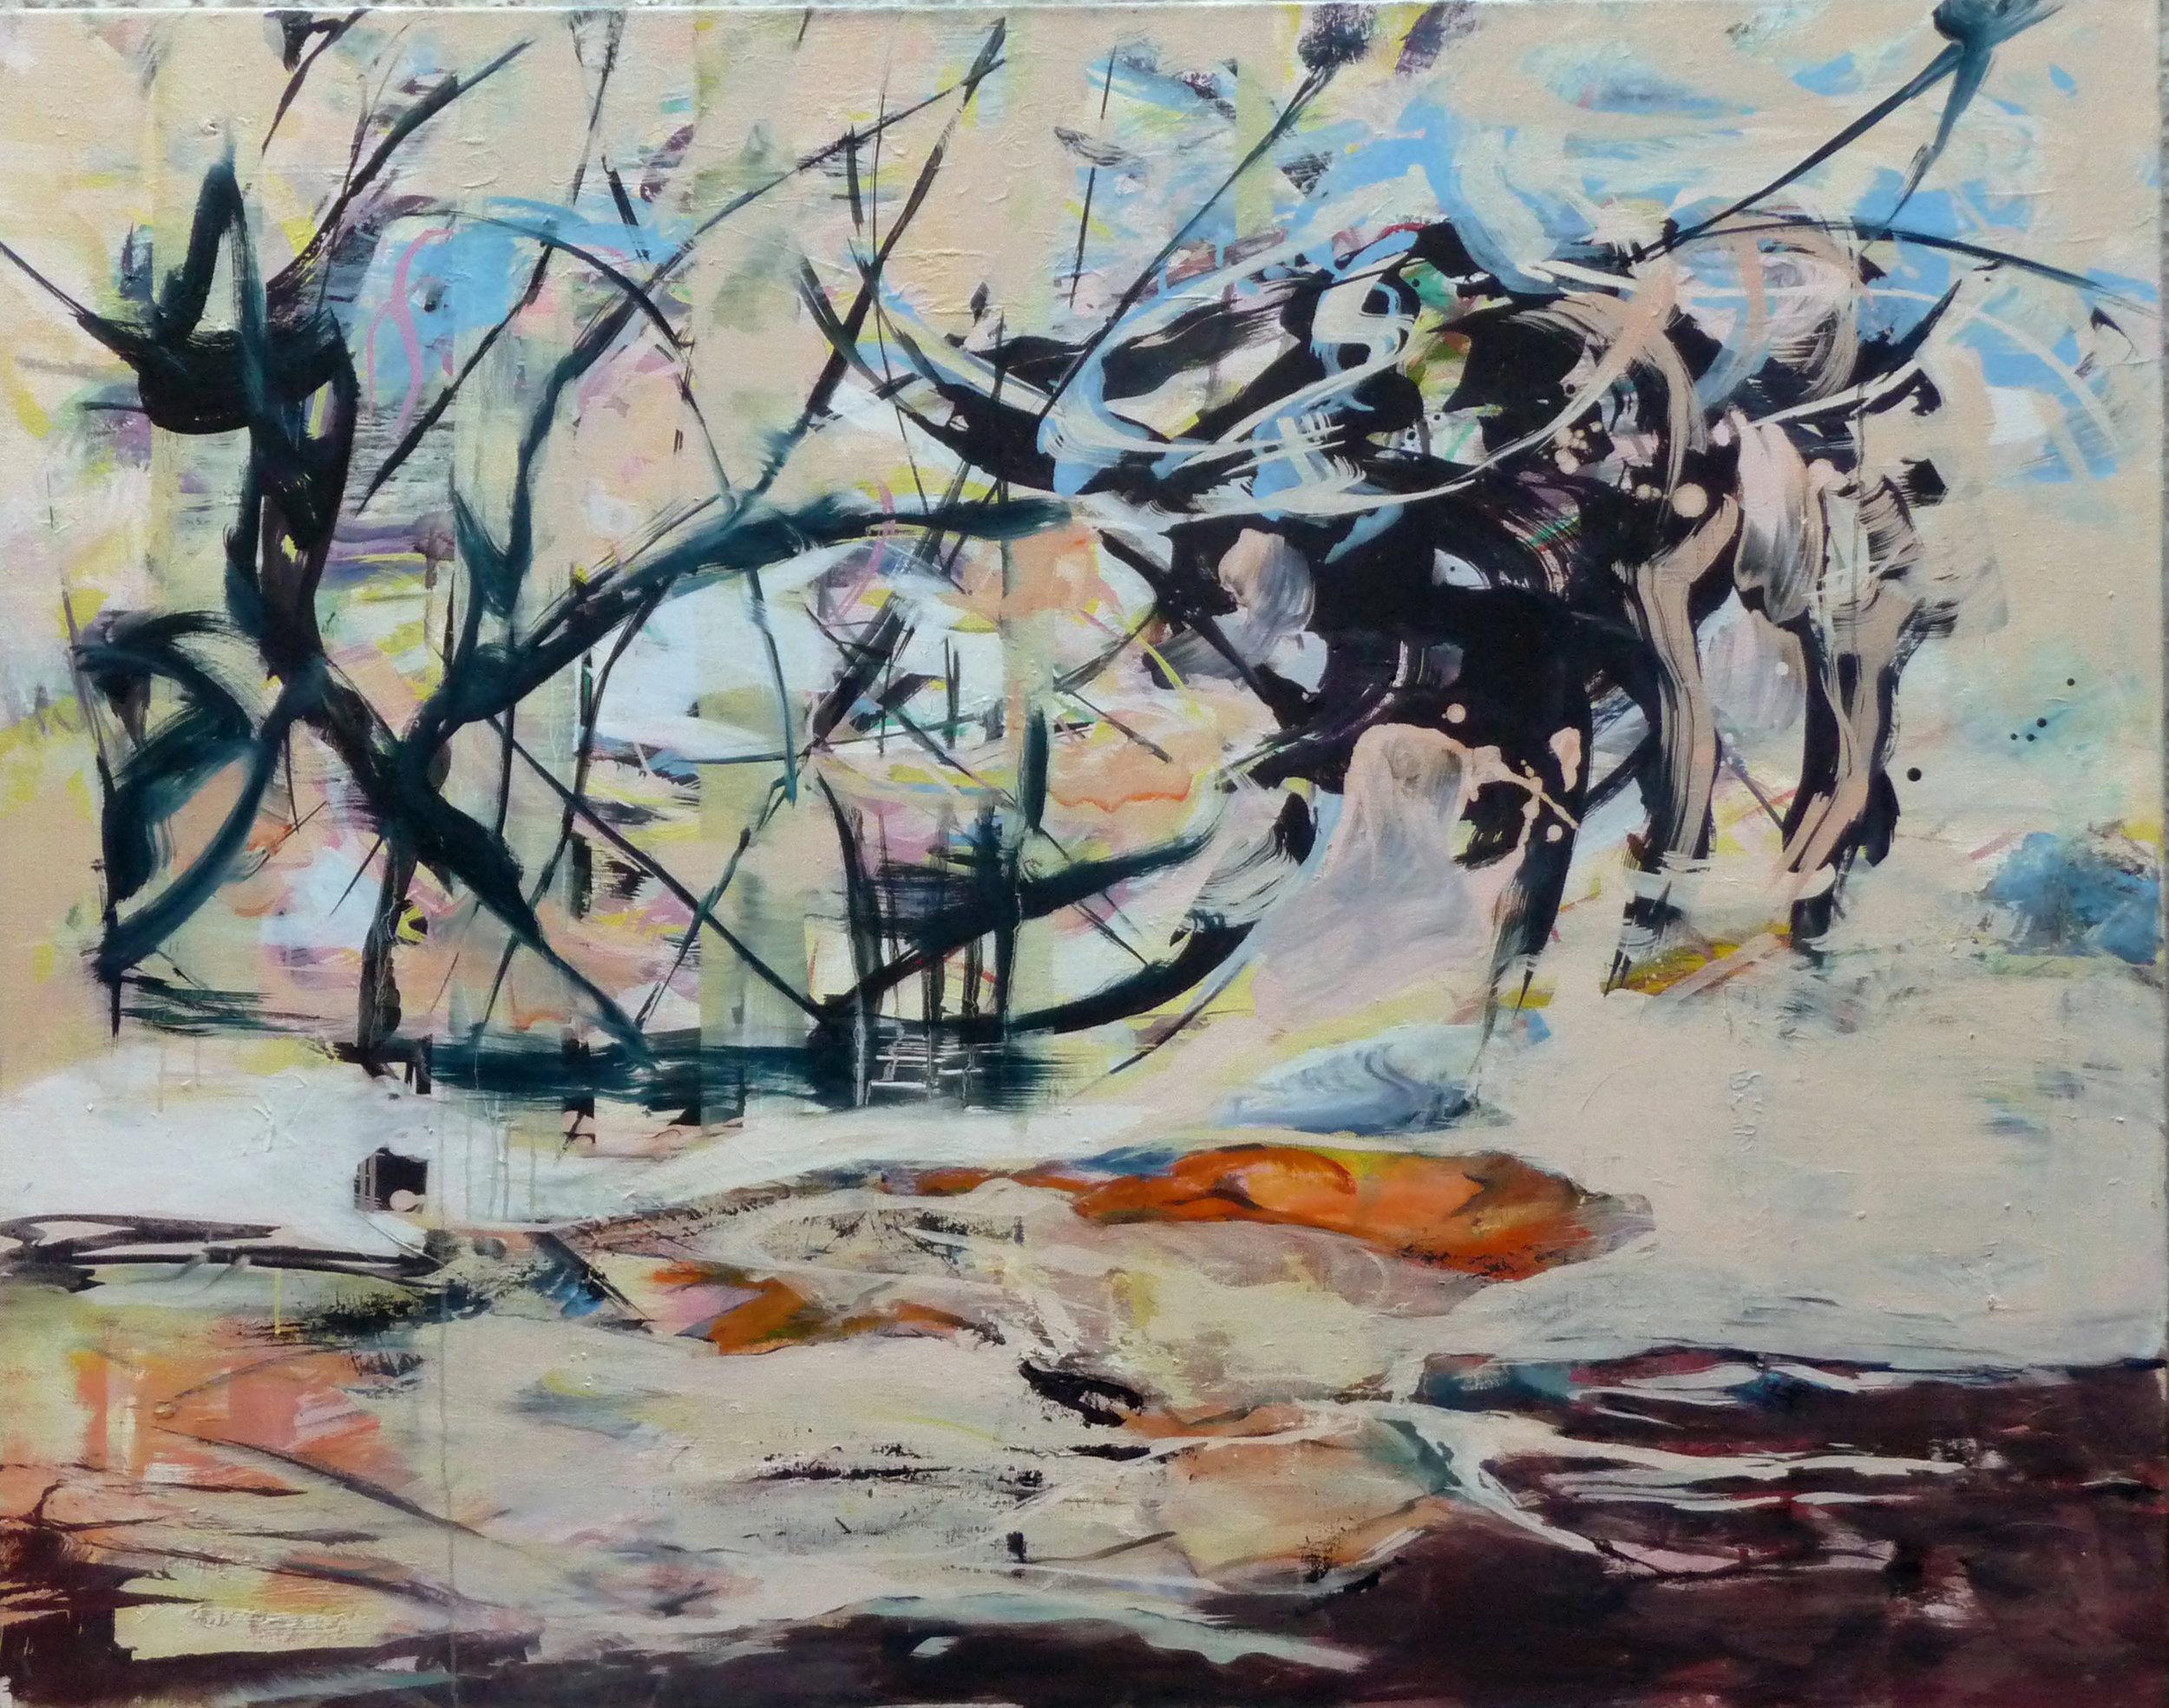 Verborgen V, oil on canvas, 110 x 140 cm